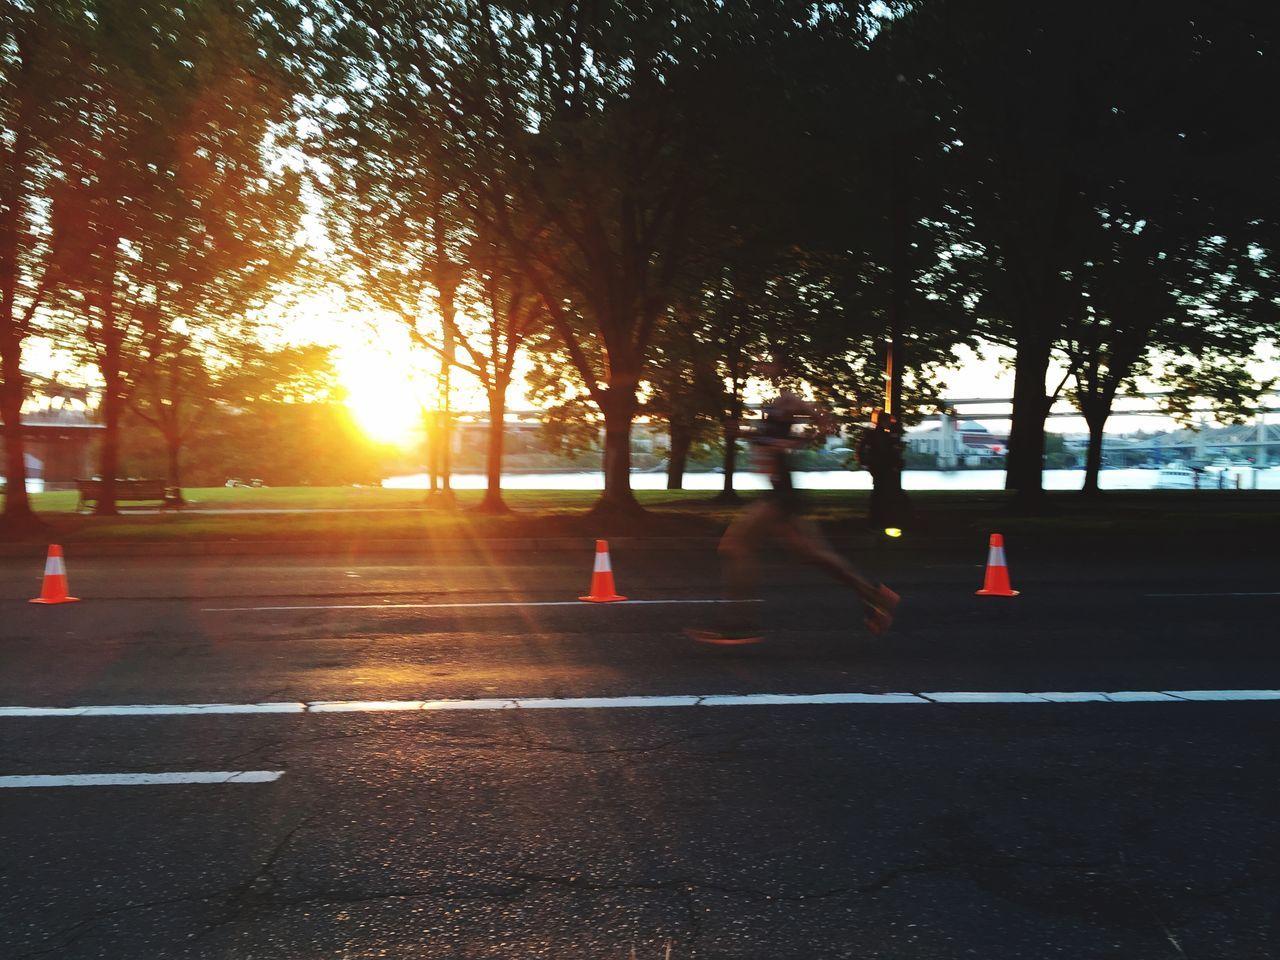 Defocused Image Of Man Running Marathon On Road By Trees